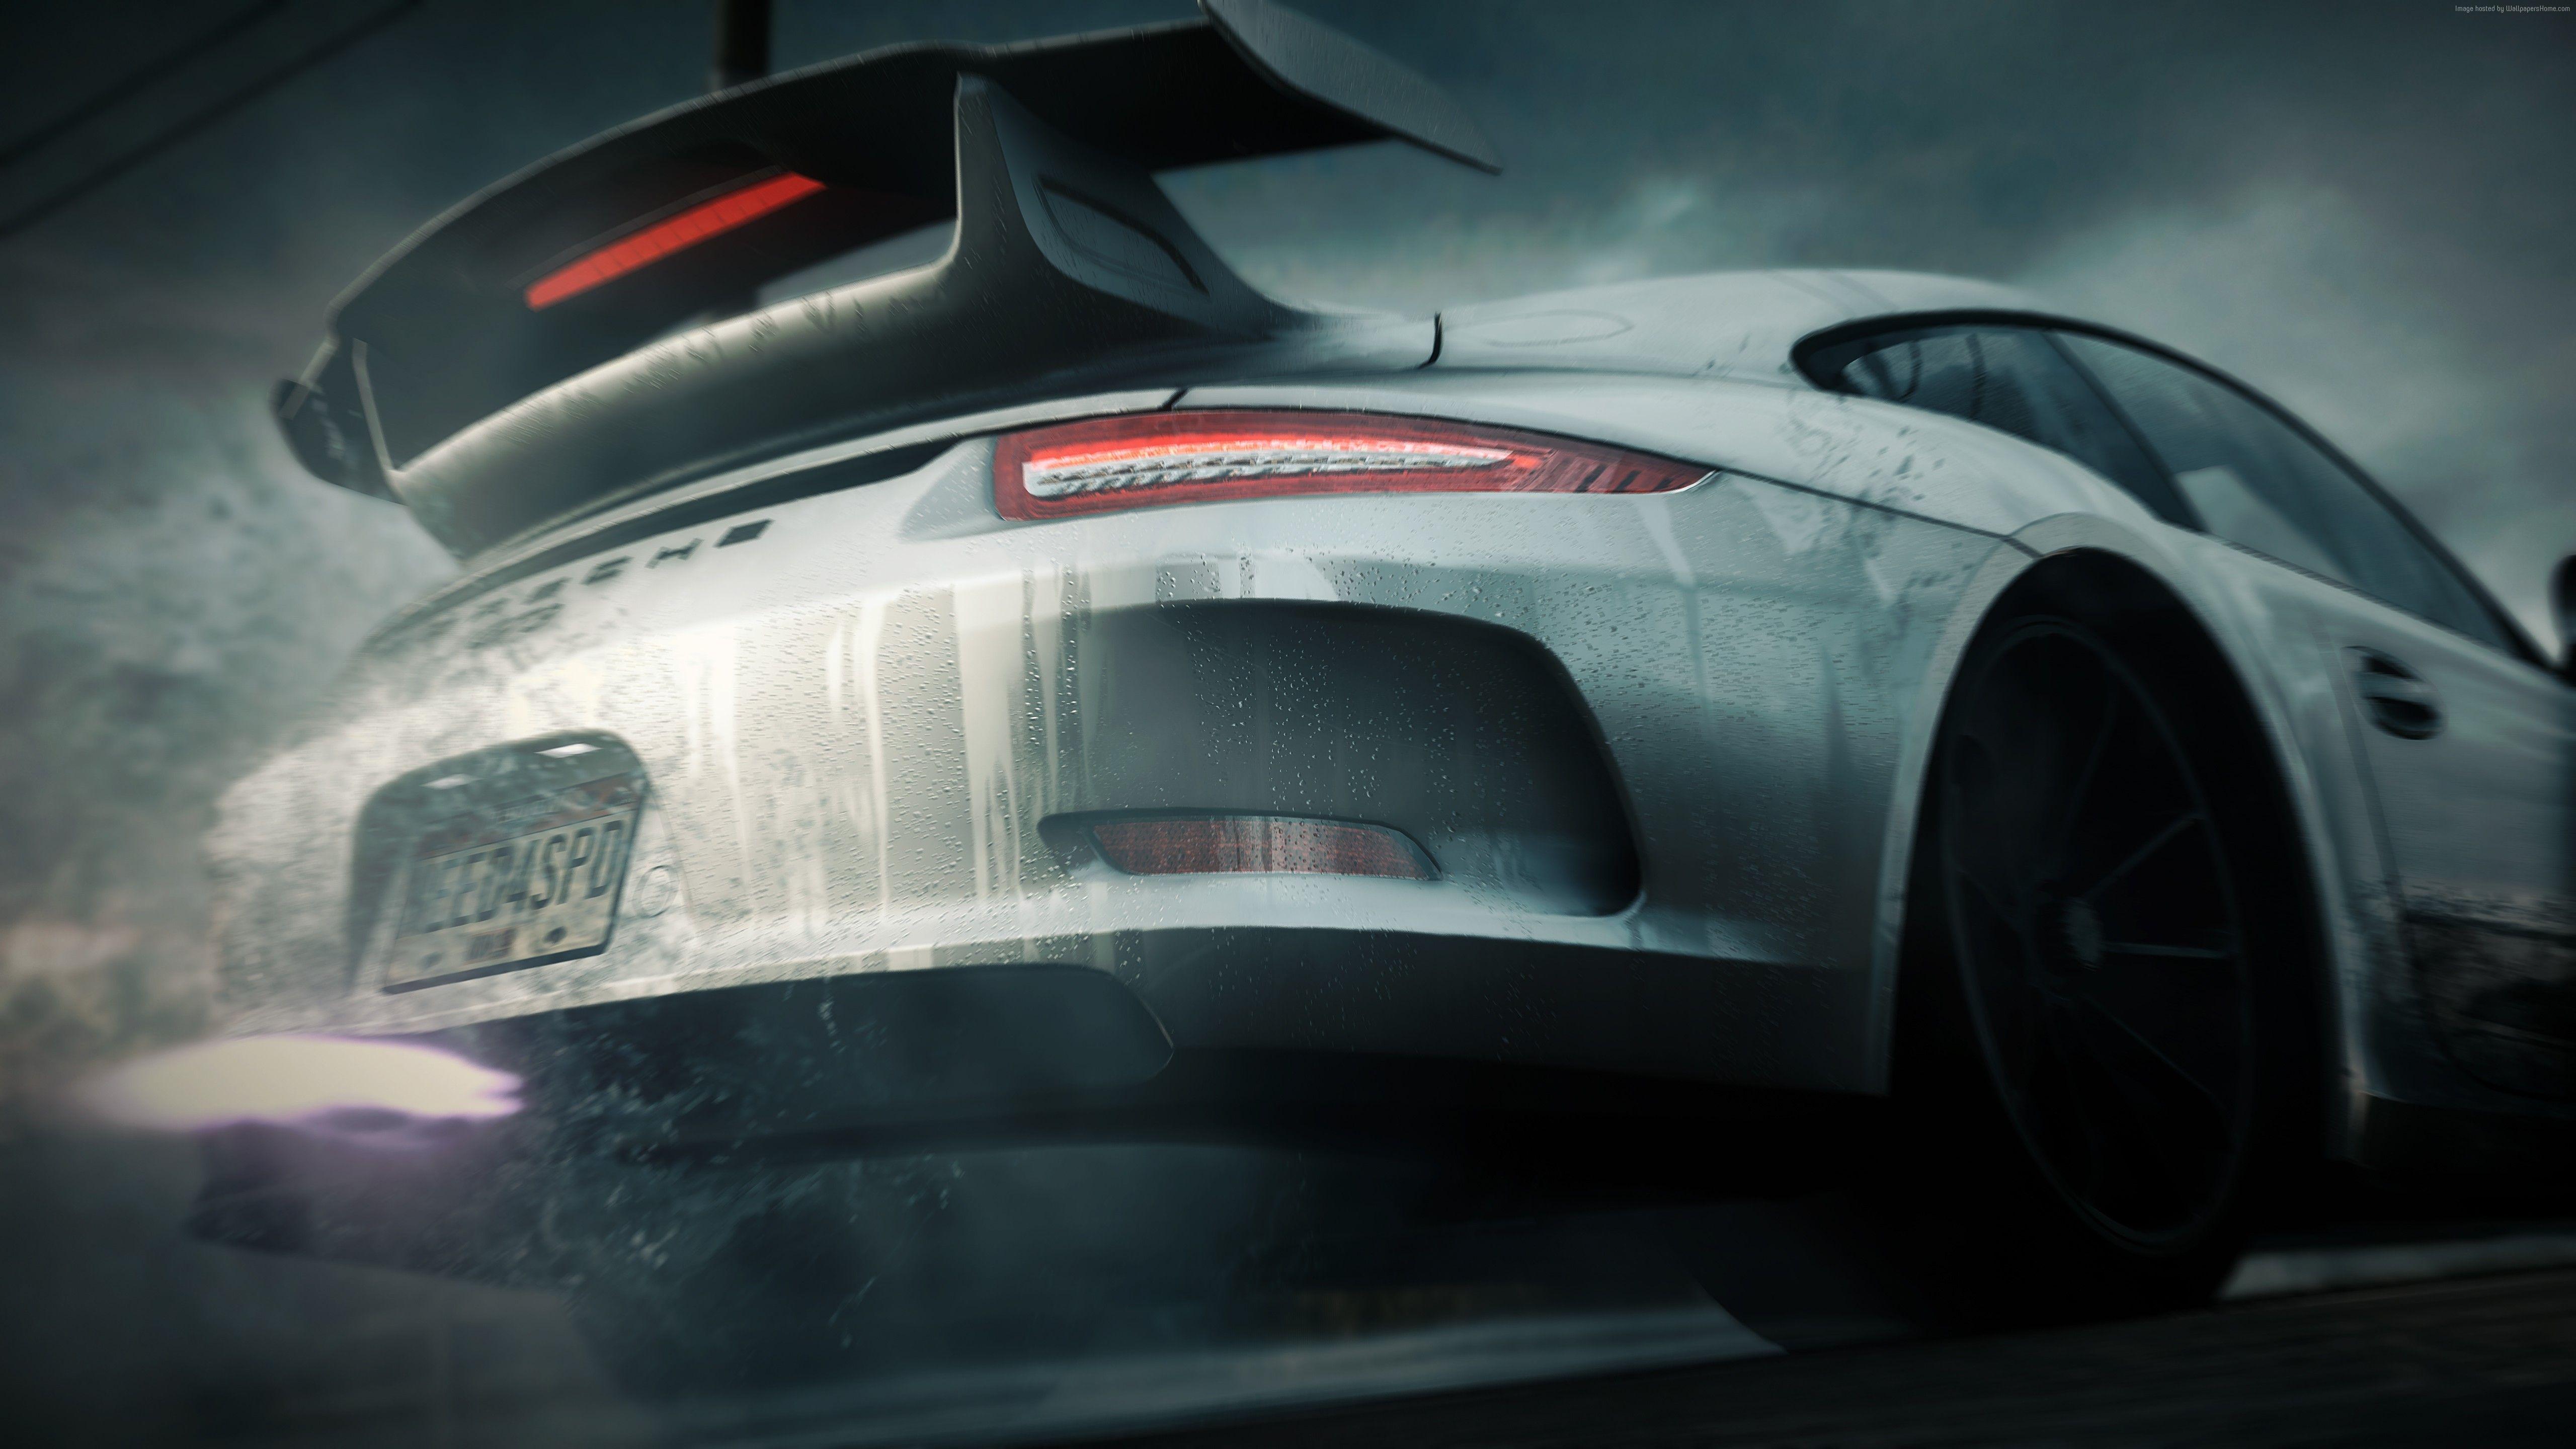 Risultati Immagini Per Porsche Wallpaper Need For Speed Melhores Imagens Marvel